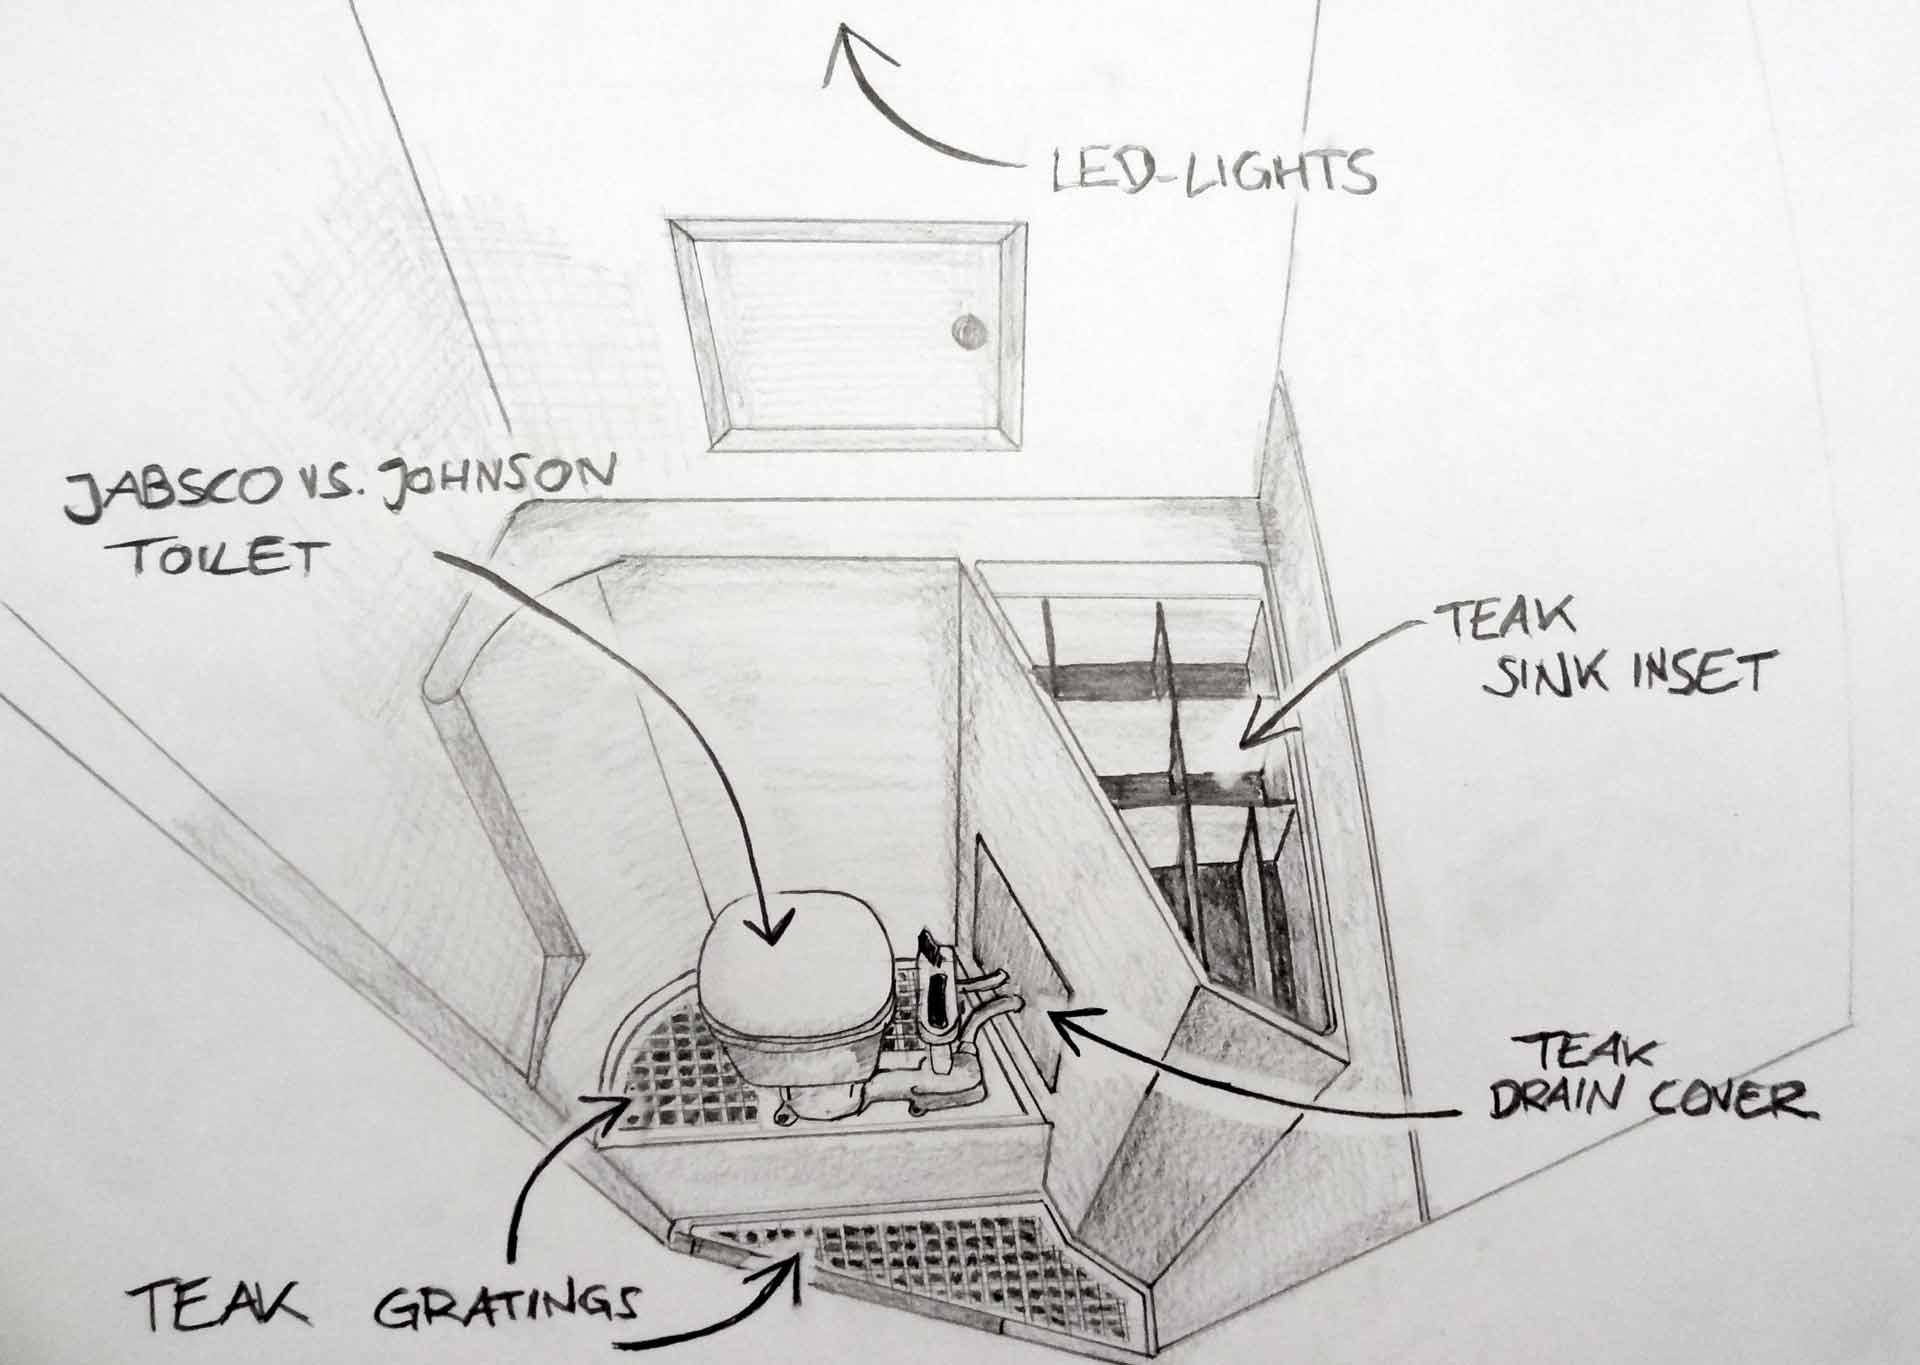 02_yacht-lavatory-refit_2